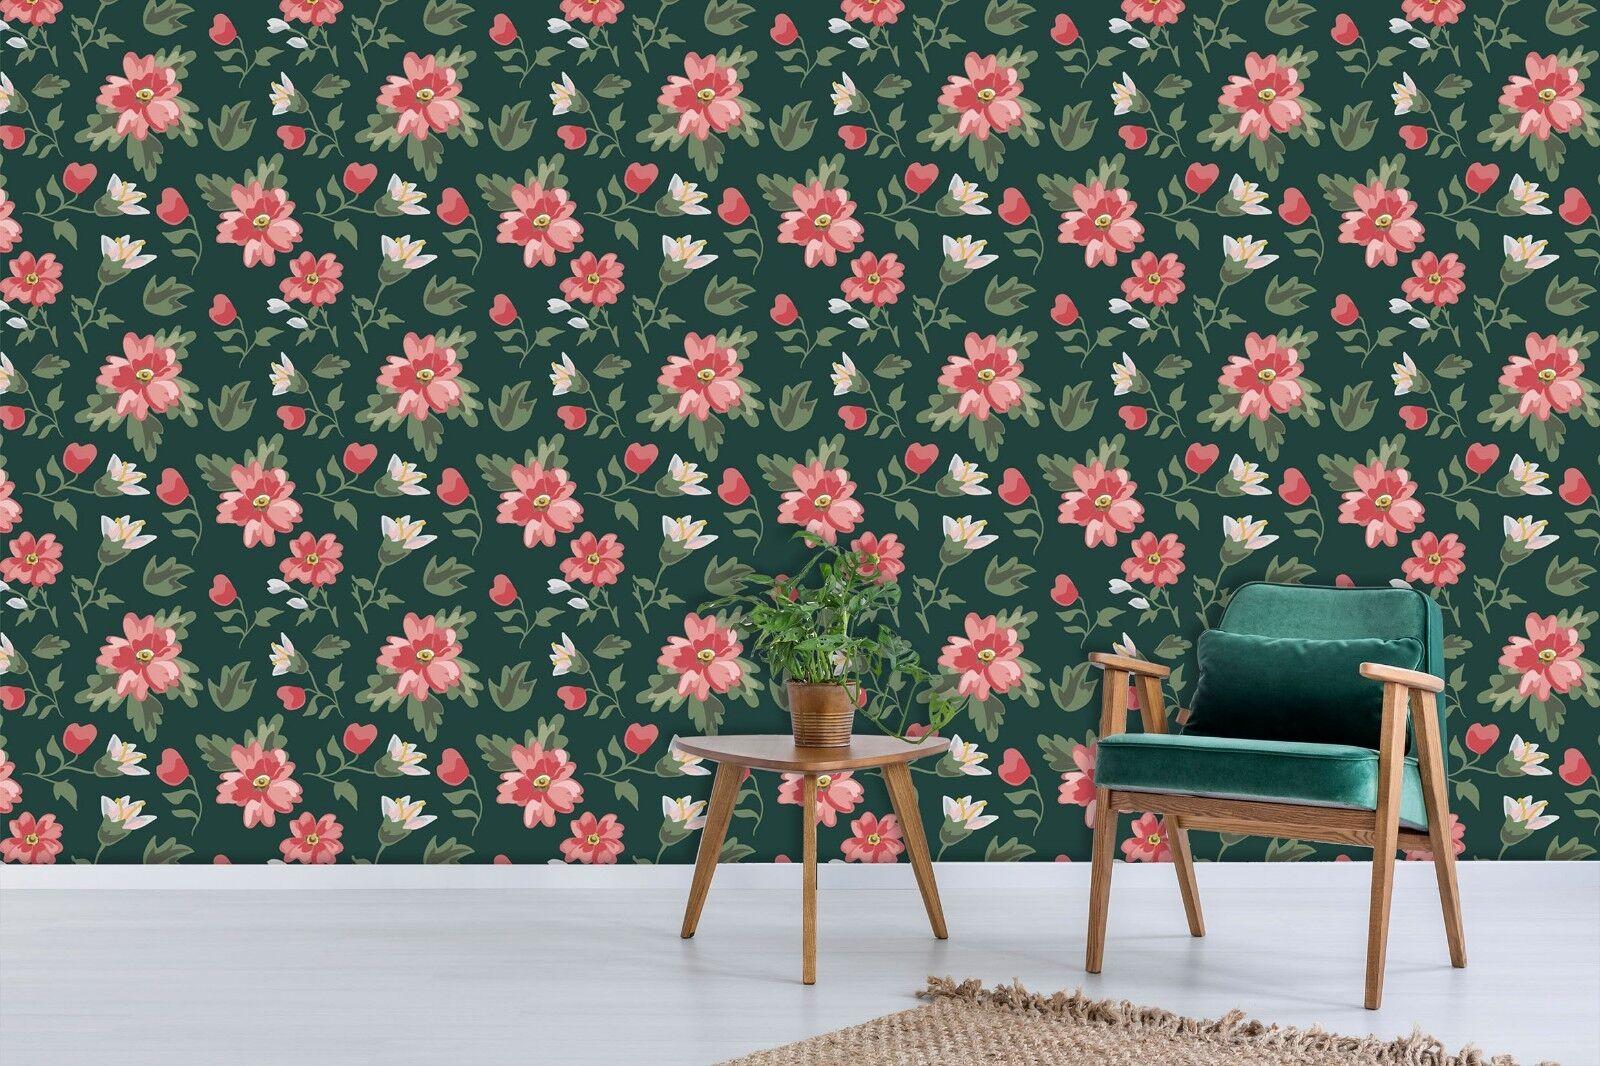 3D rot Flower 701 Wall Paper Print Wall Decal Deco Indoor Wall Murals US Summer